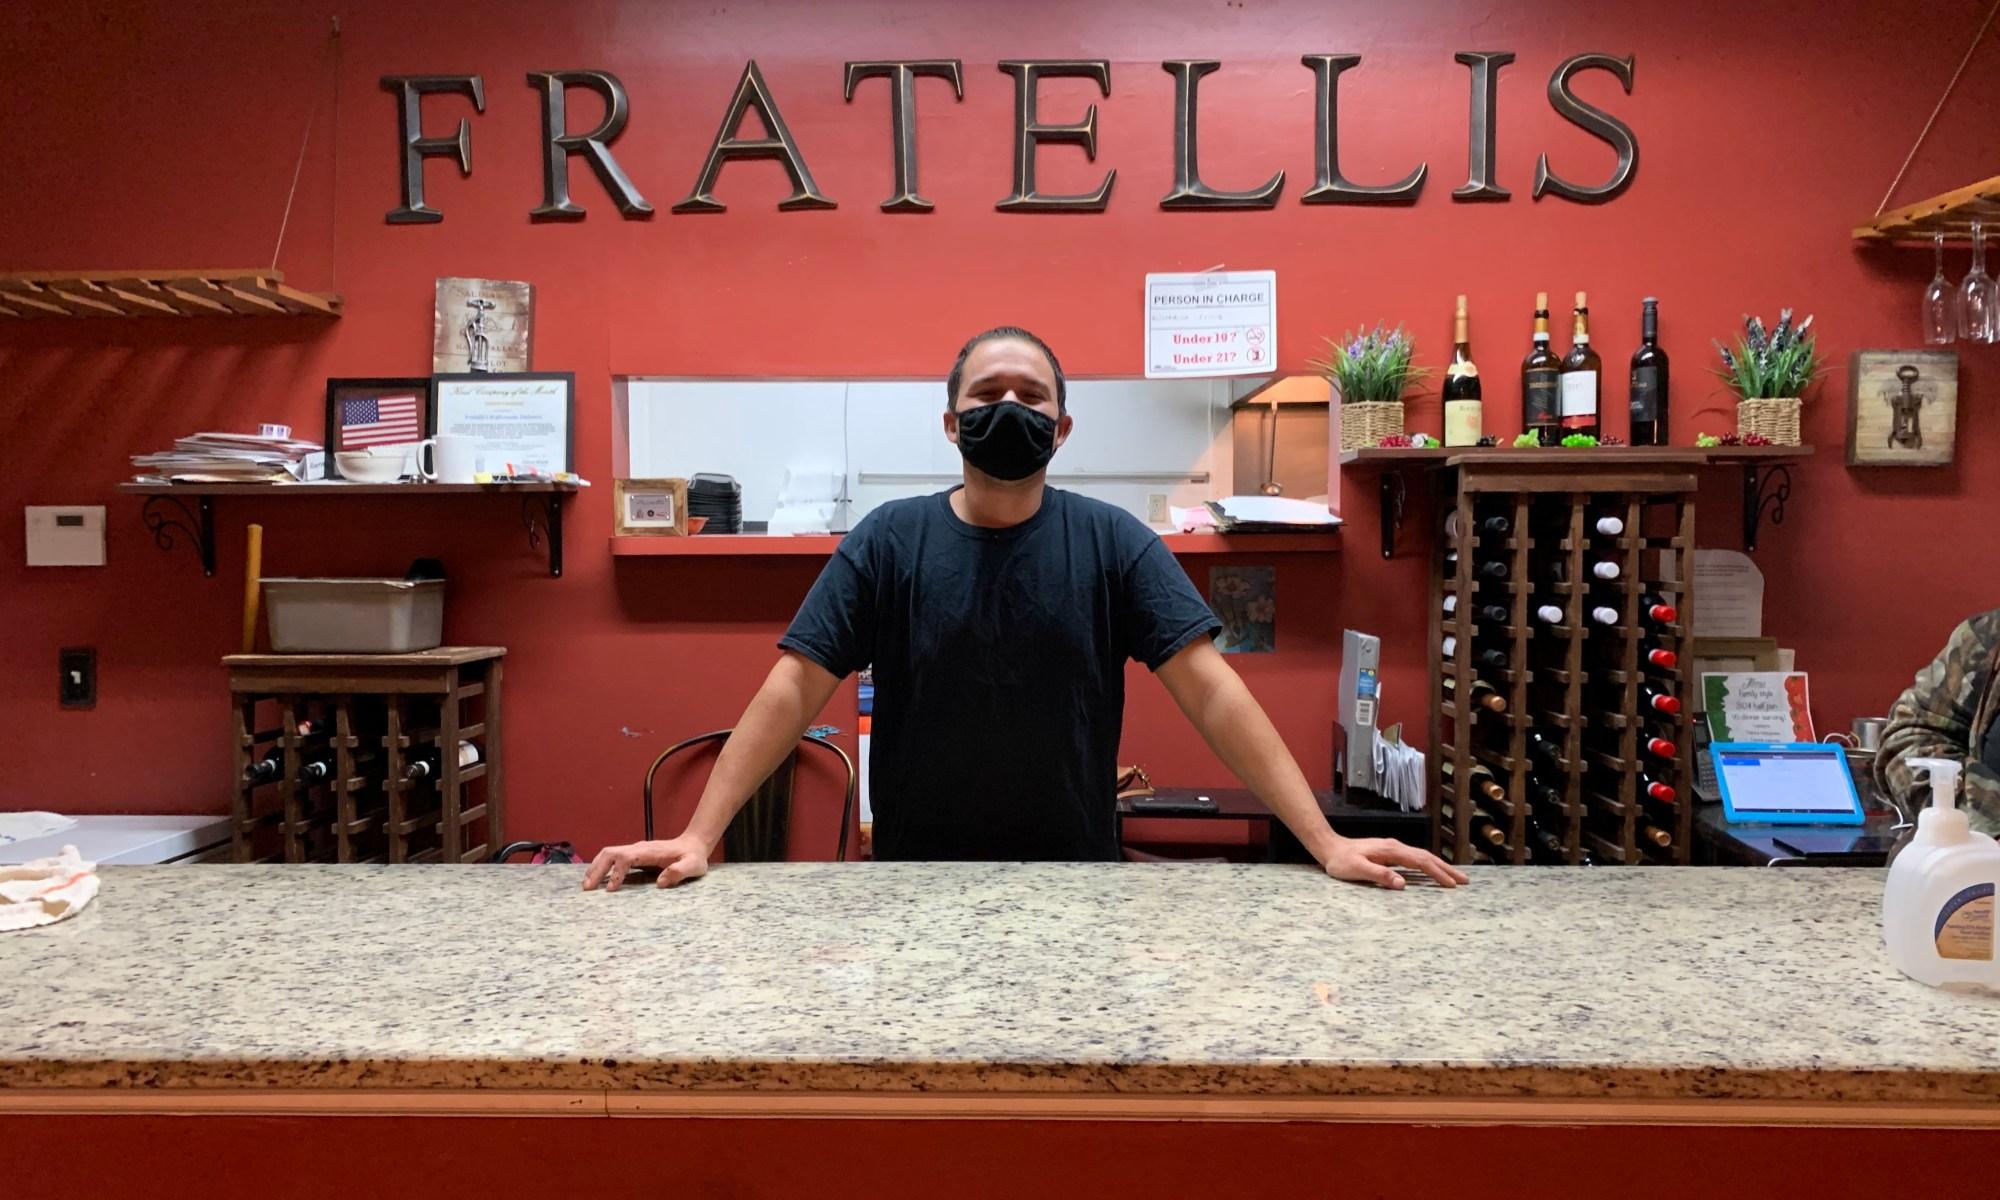 Fratelli's restaurants